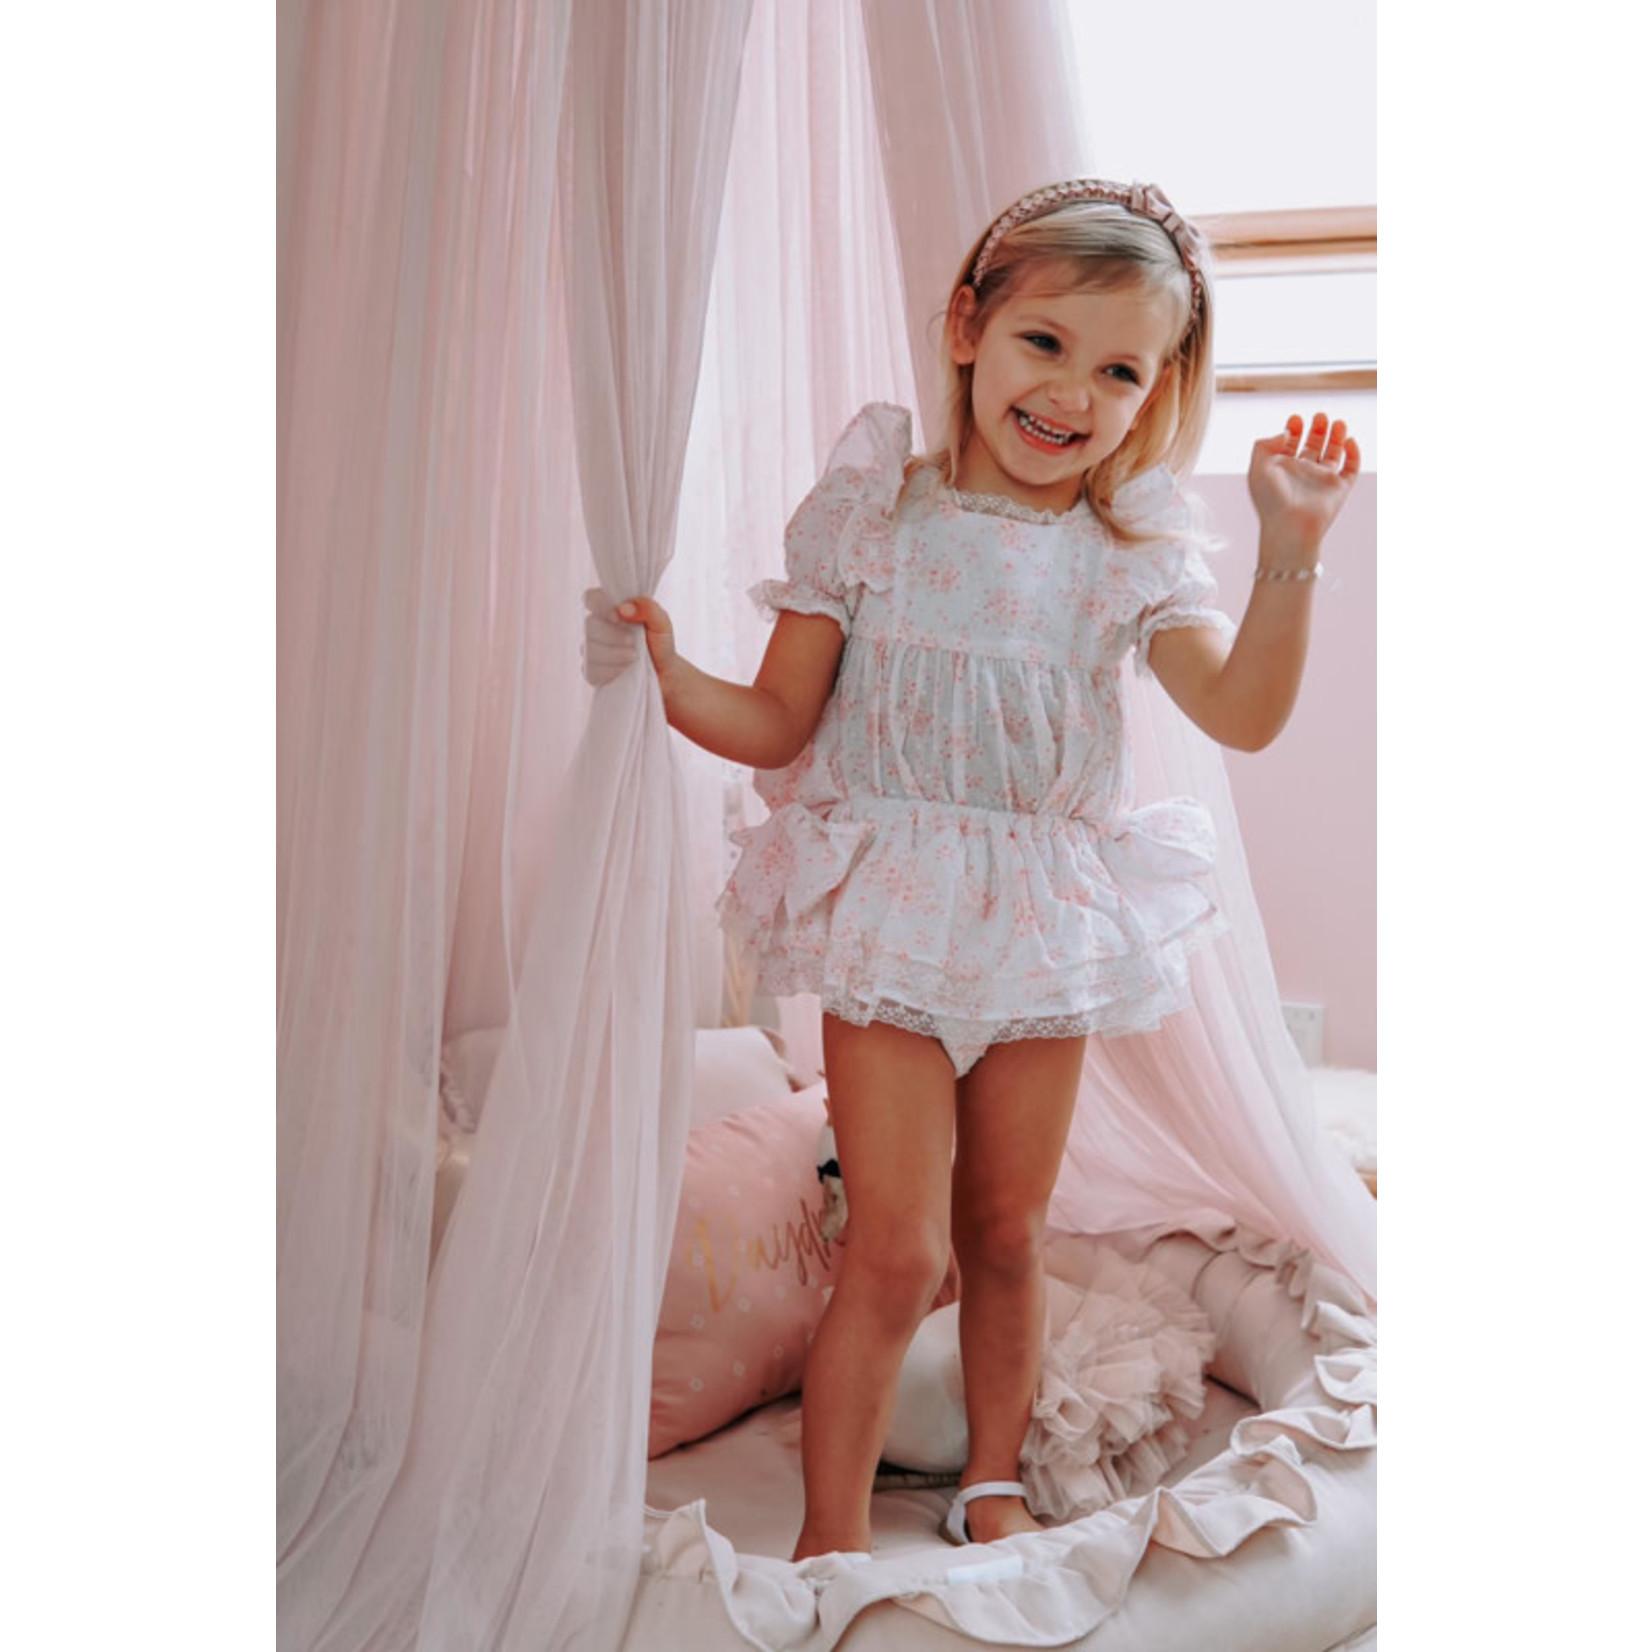 Petite Zara Copy of Bloomer Ollie - Petite Zara Label